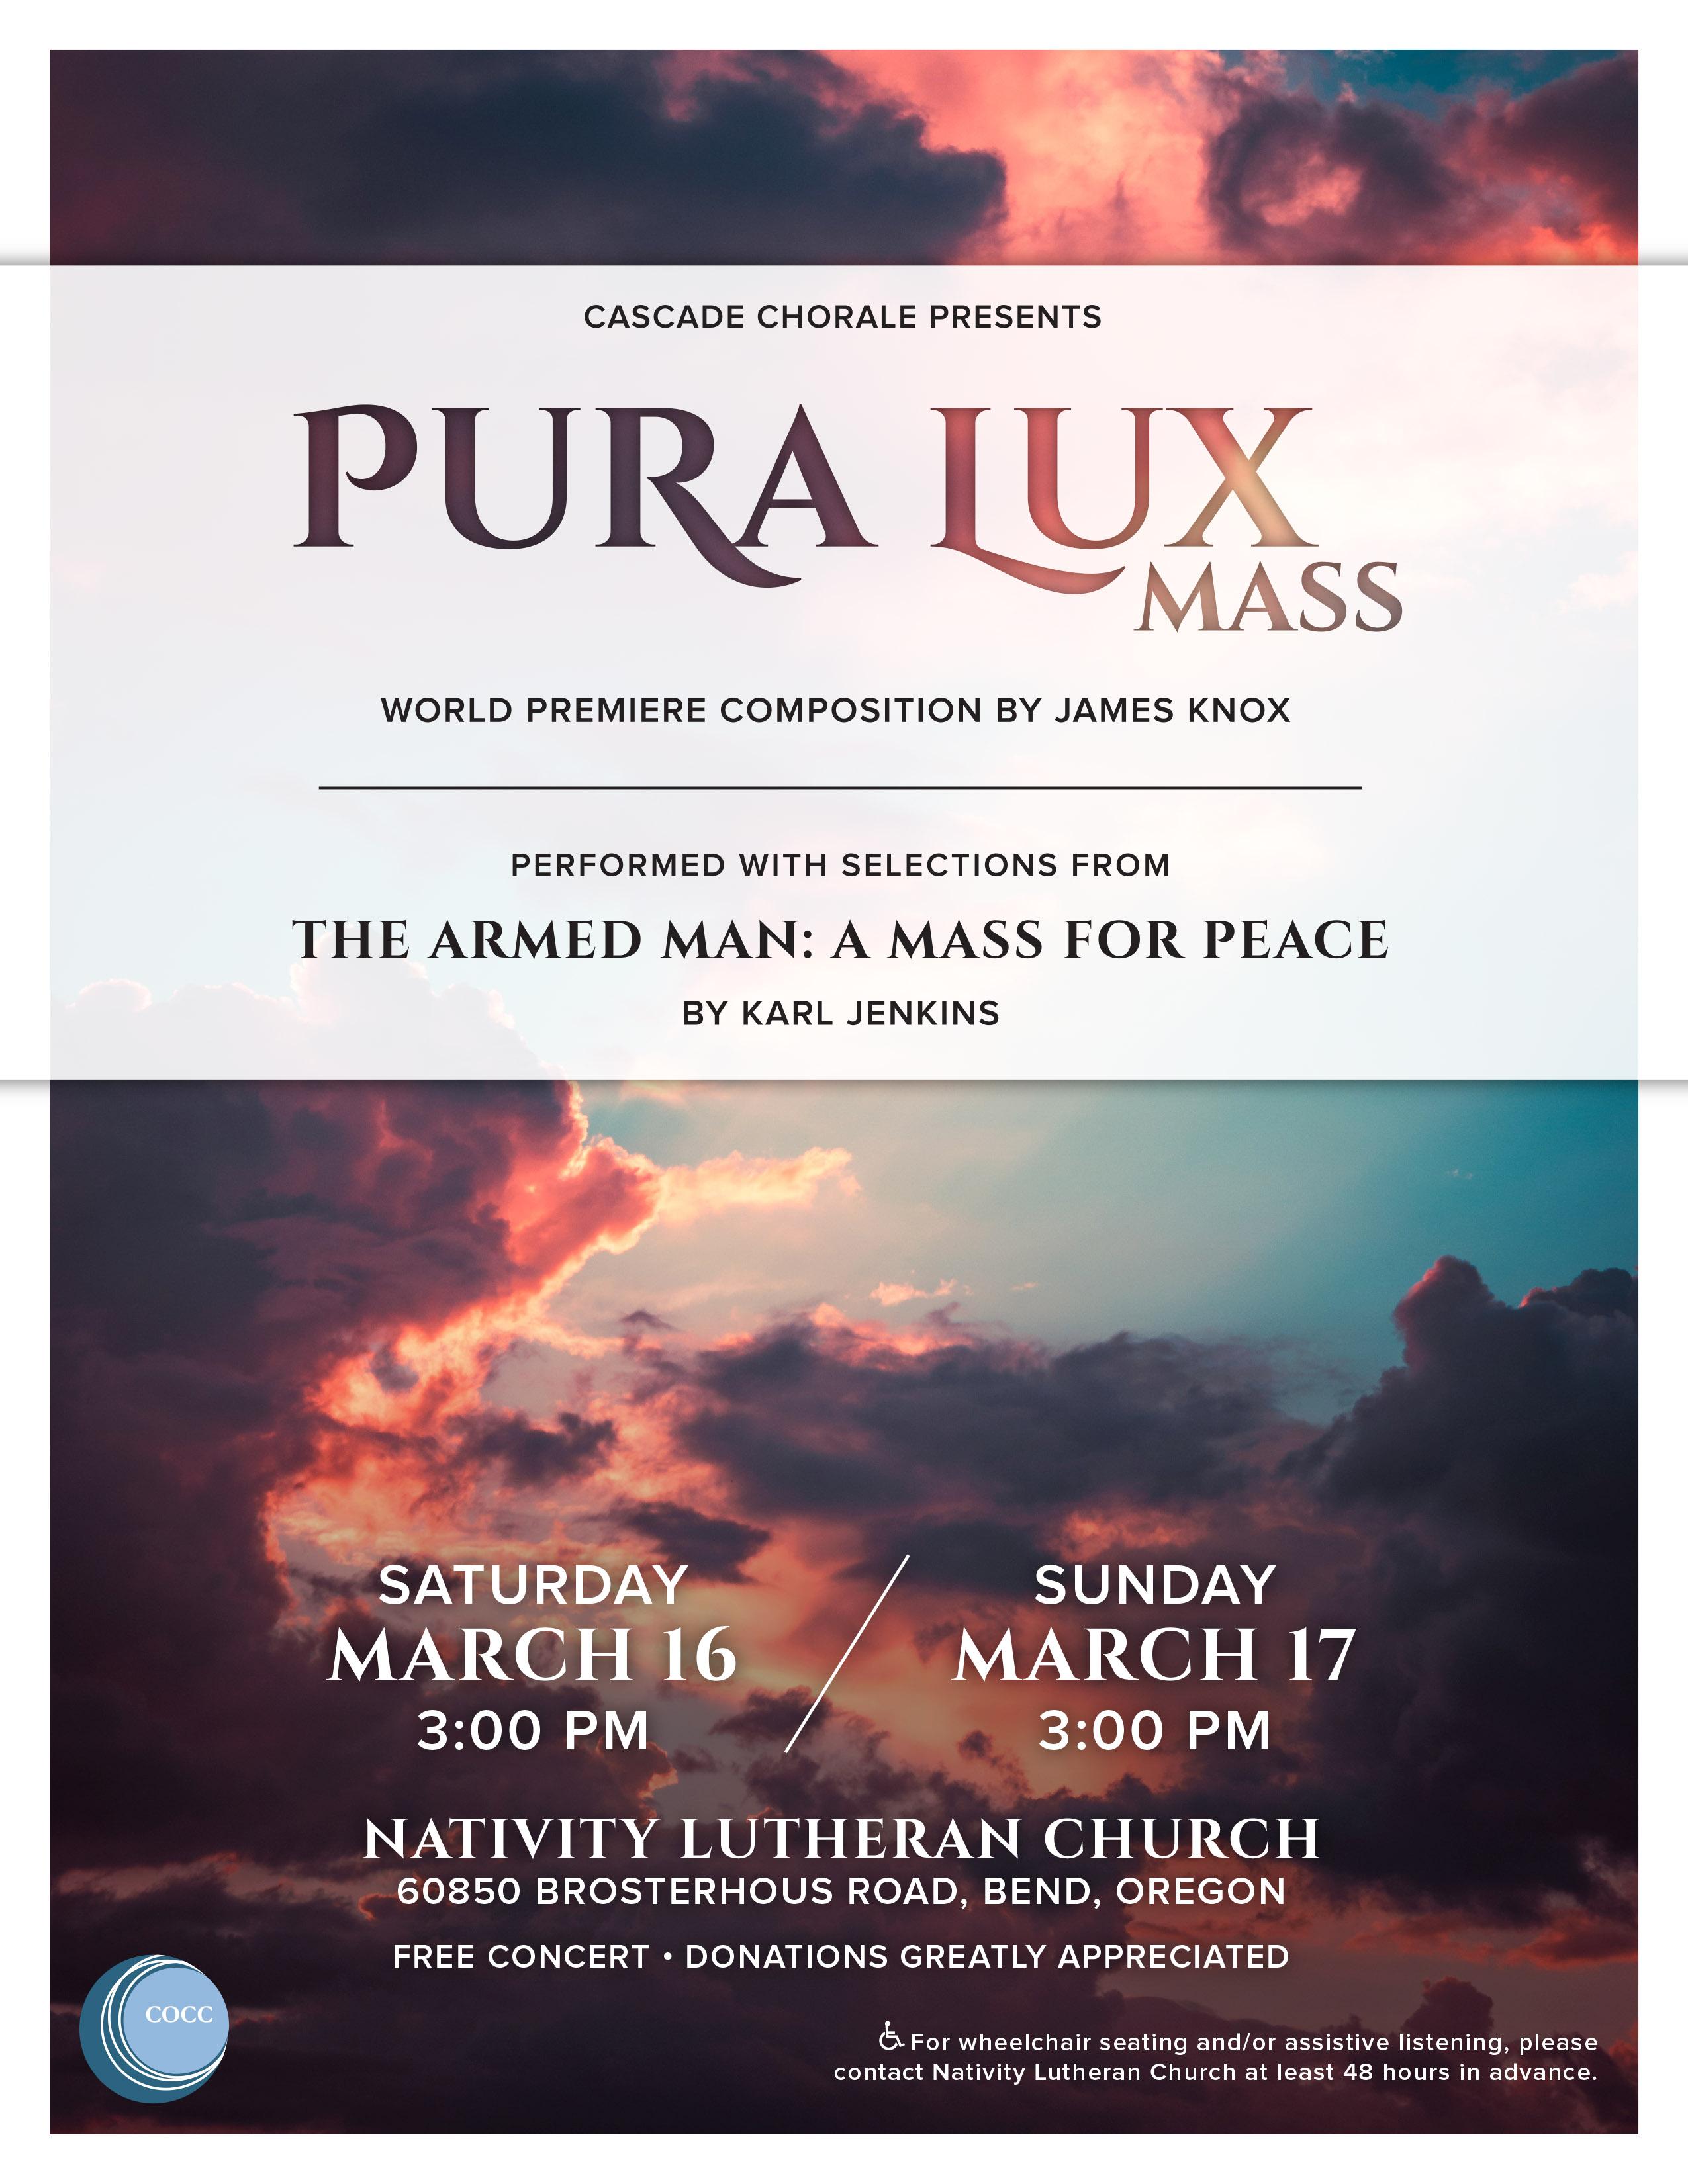 Cascade Chorale premieres Pura Lux